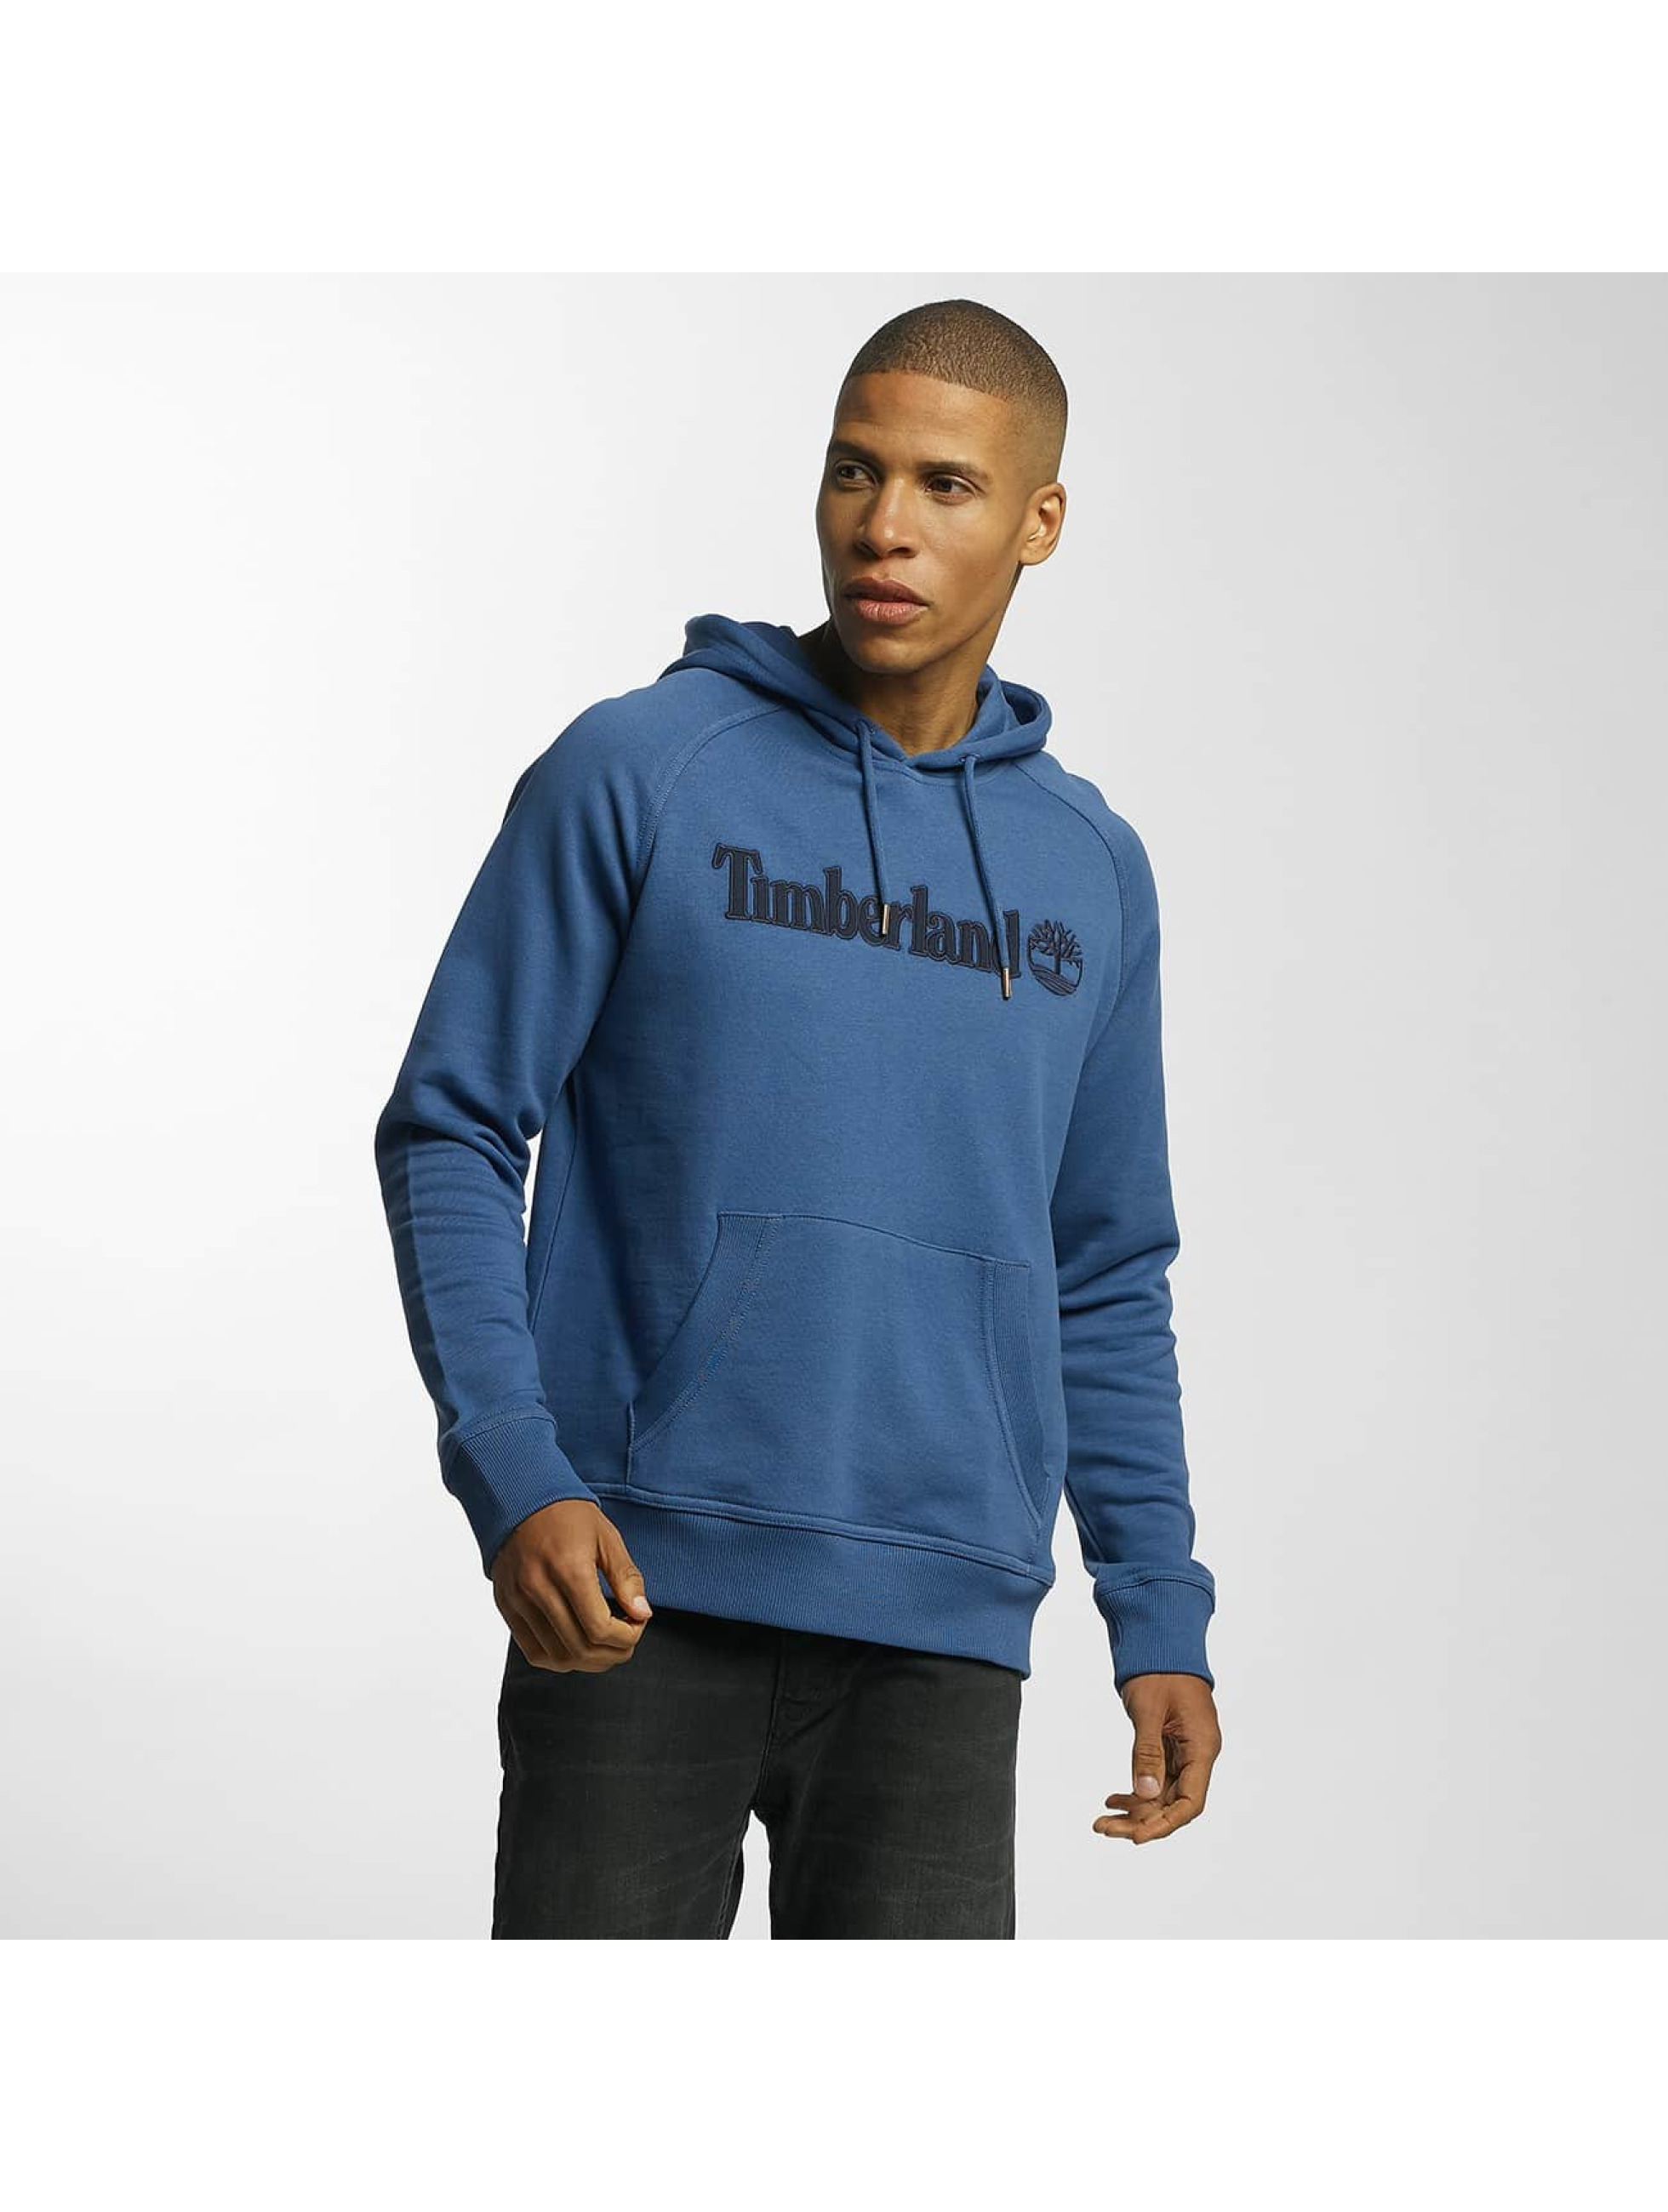 Timberland Bluzy z kapturem Graph niebieski